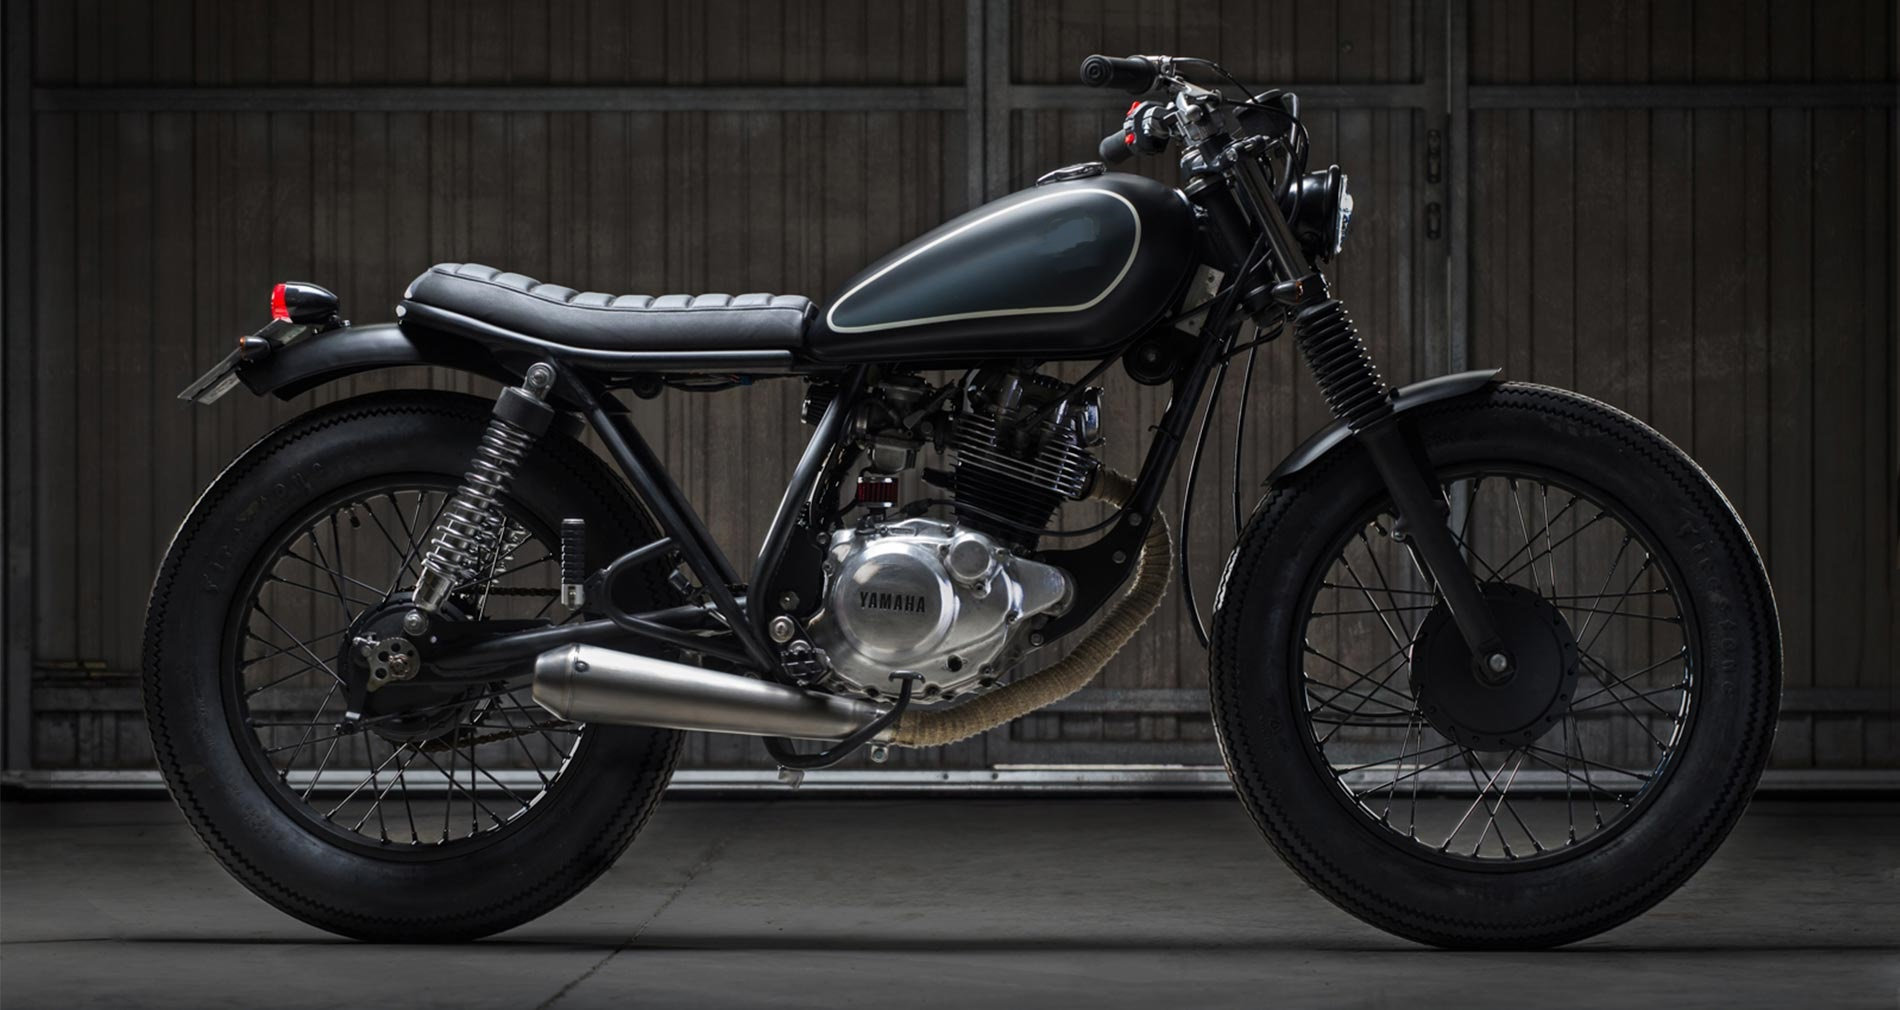 Yamaha SR125cc - Location: BARCELONA